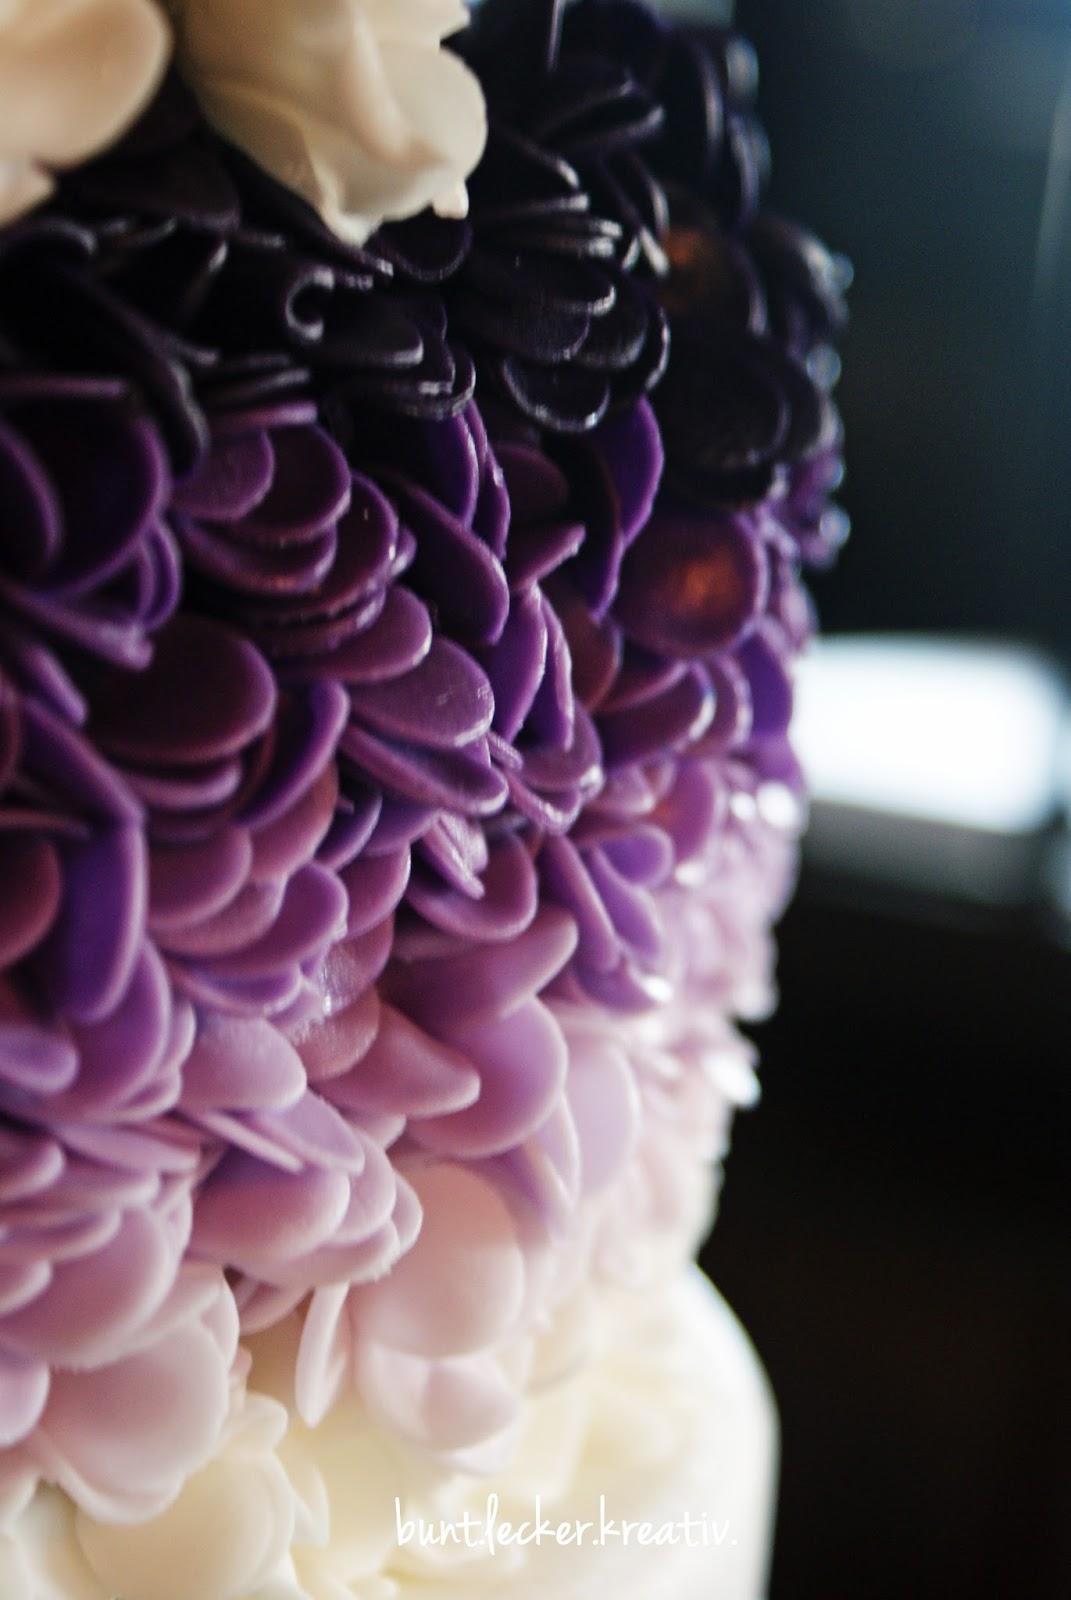 Hochzeitstorte In Lila Tonen Bunt Lecker Kreativ